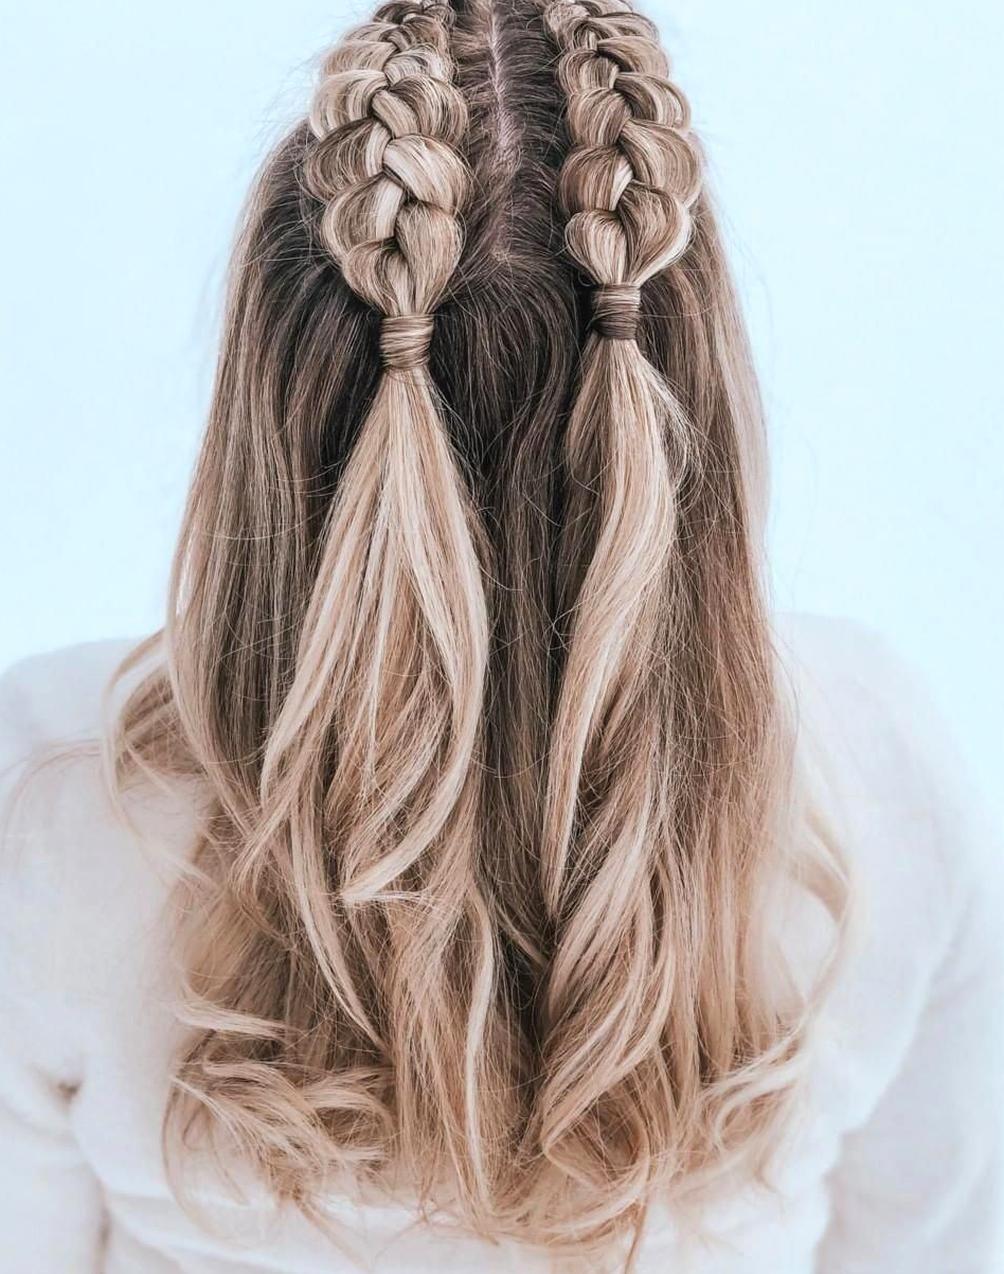 Frisurenfrisuren Tumblr Tumblr Frisuren Frisuren Tumblr In 2020 Hair Styles Medium Length Hair Styles Kids Braided Hairstyles